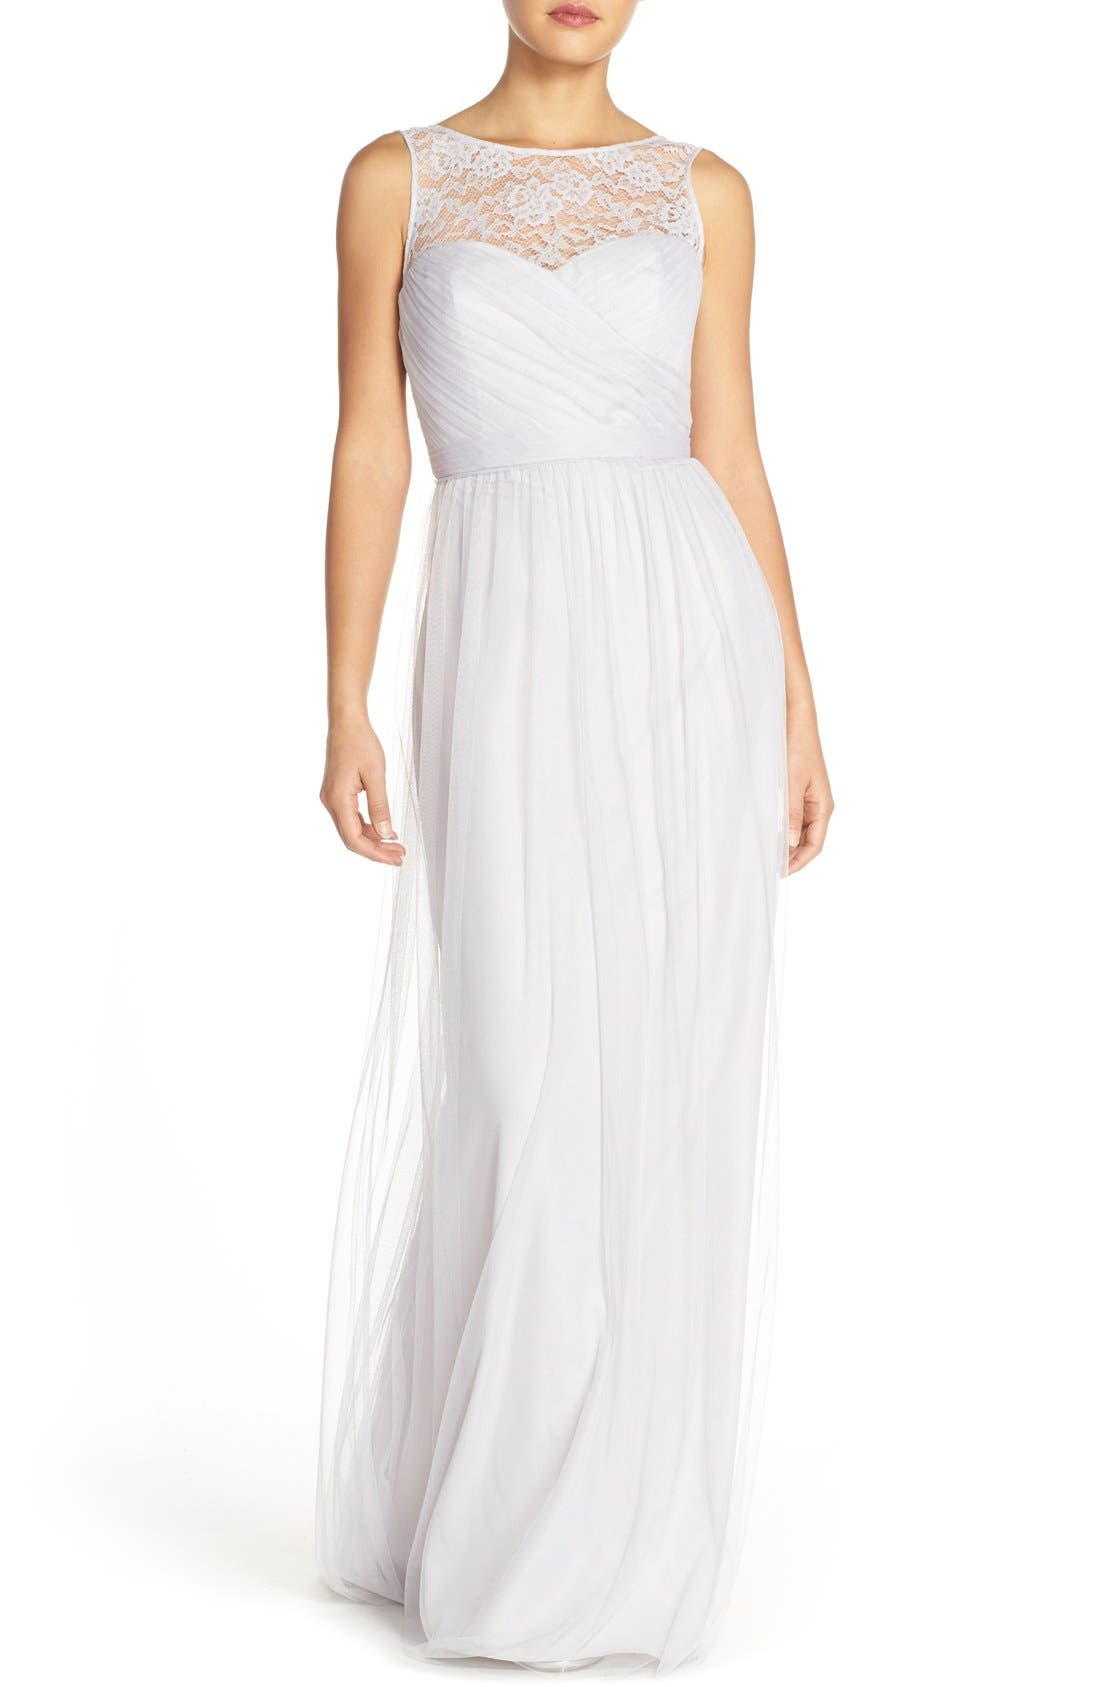 Main Image - Amsale 'Chandra' Illusion Yoke Lace & Tulle Gown